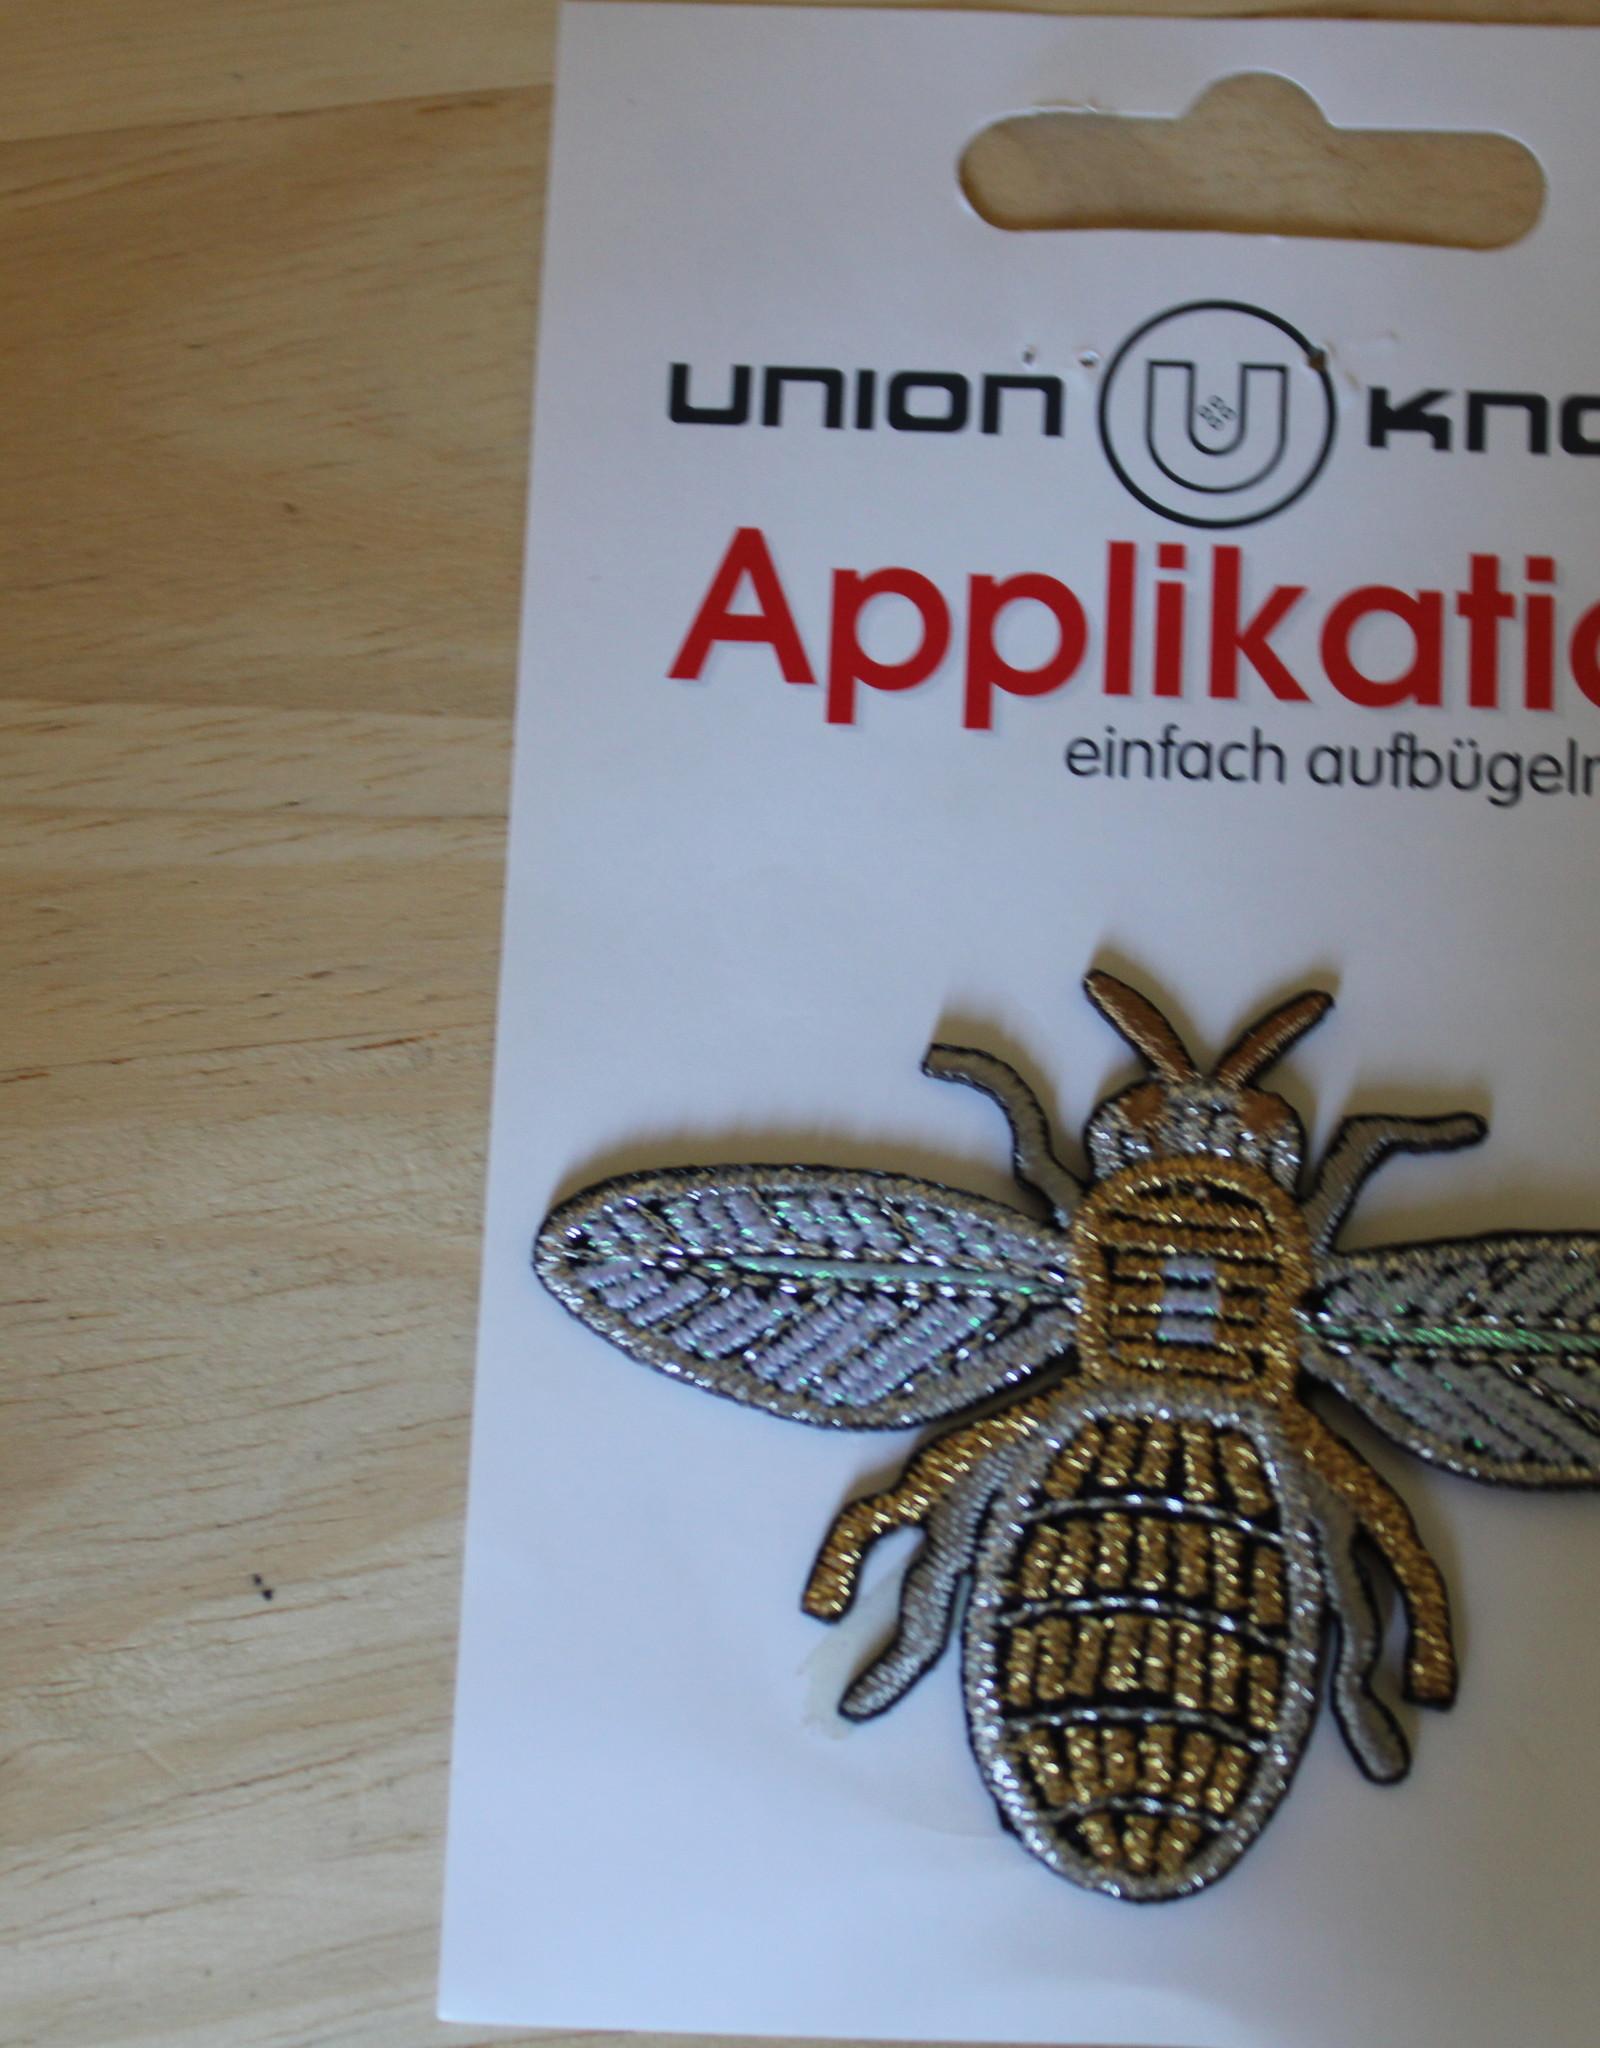 Union Knopf applicatie wesp